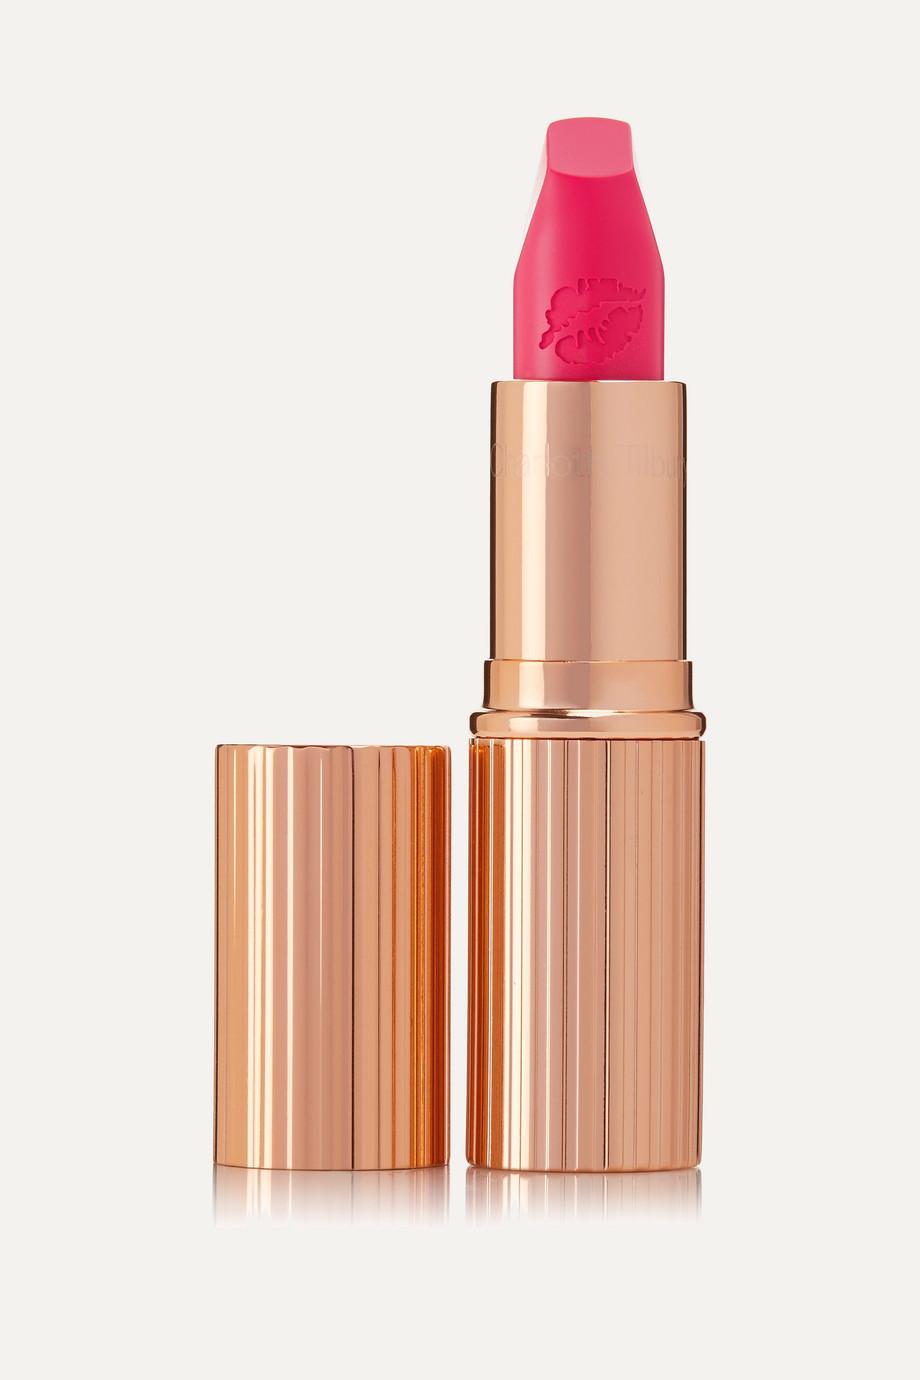 Charlotte Tilbury Rouge à lèvres Hot Lips, Electric Poppy